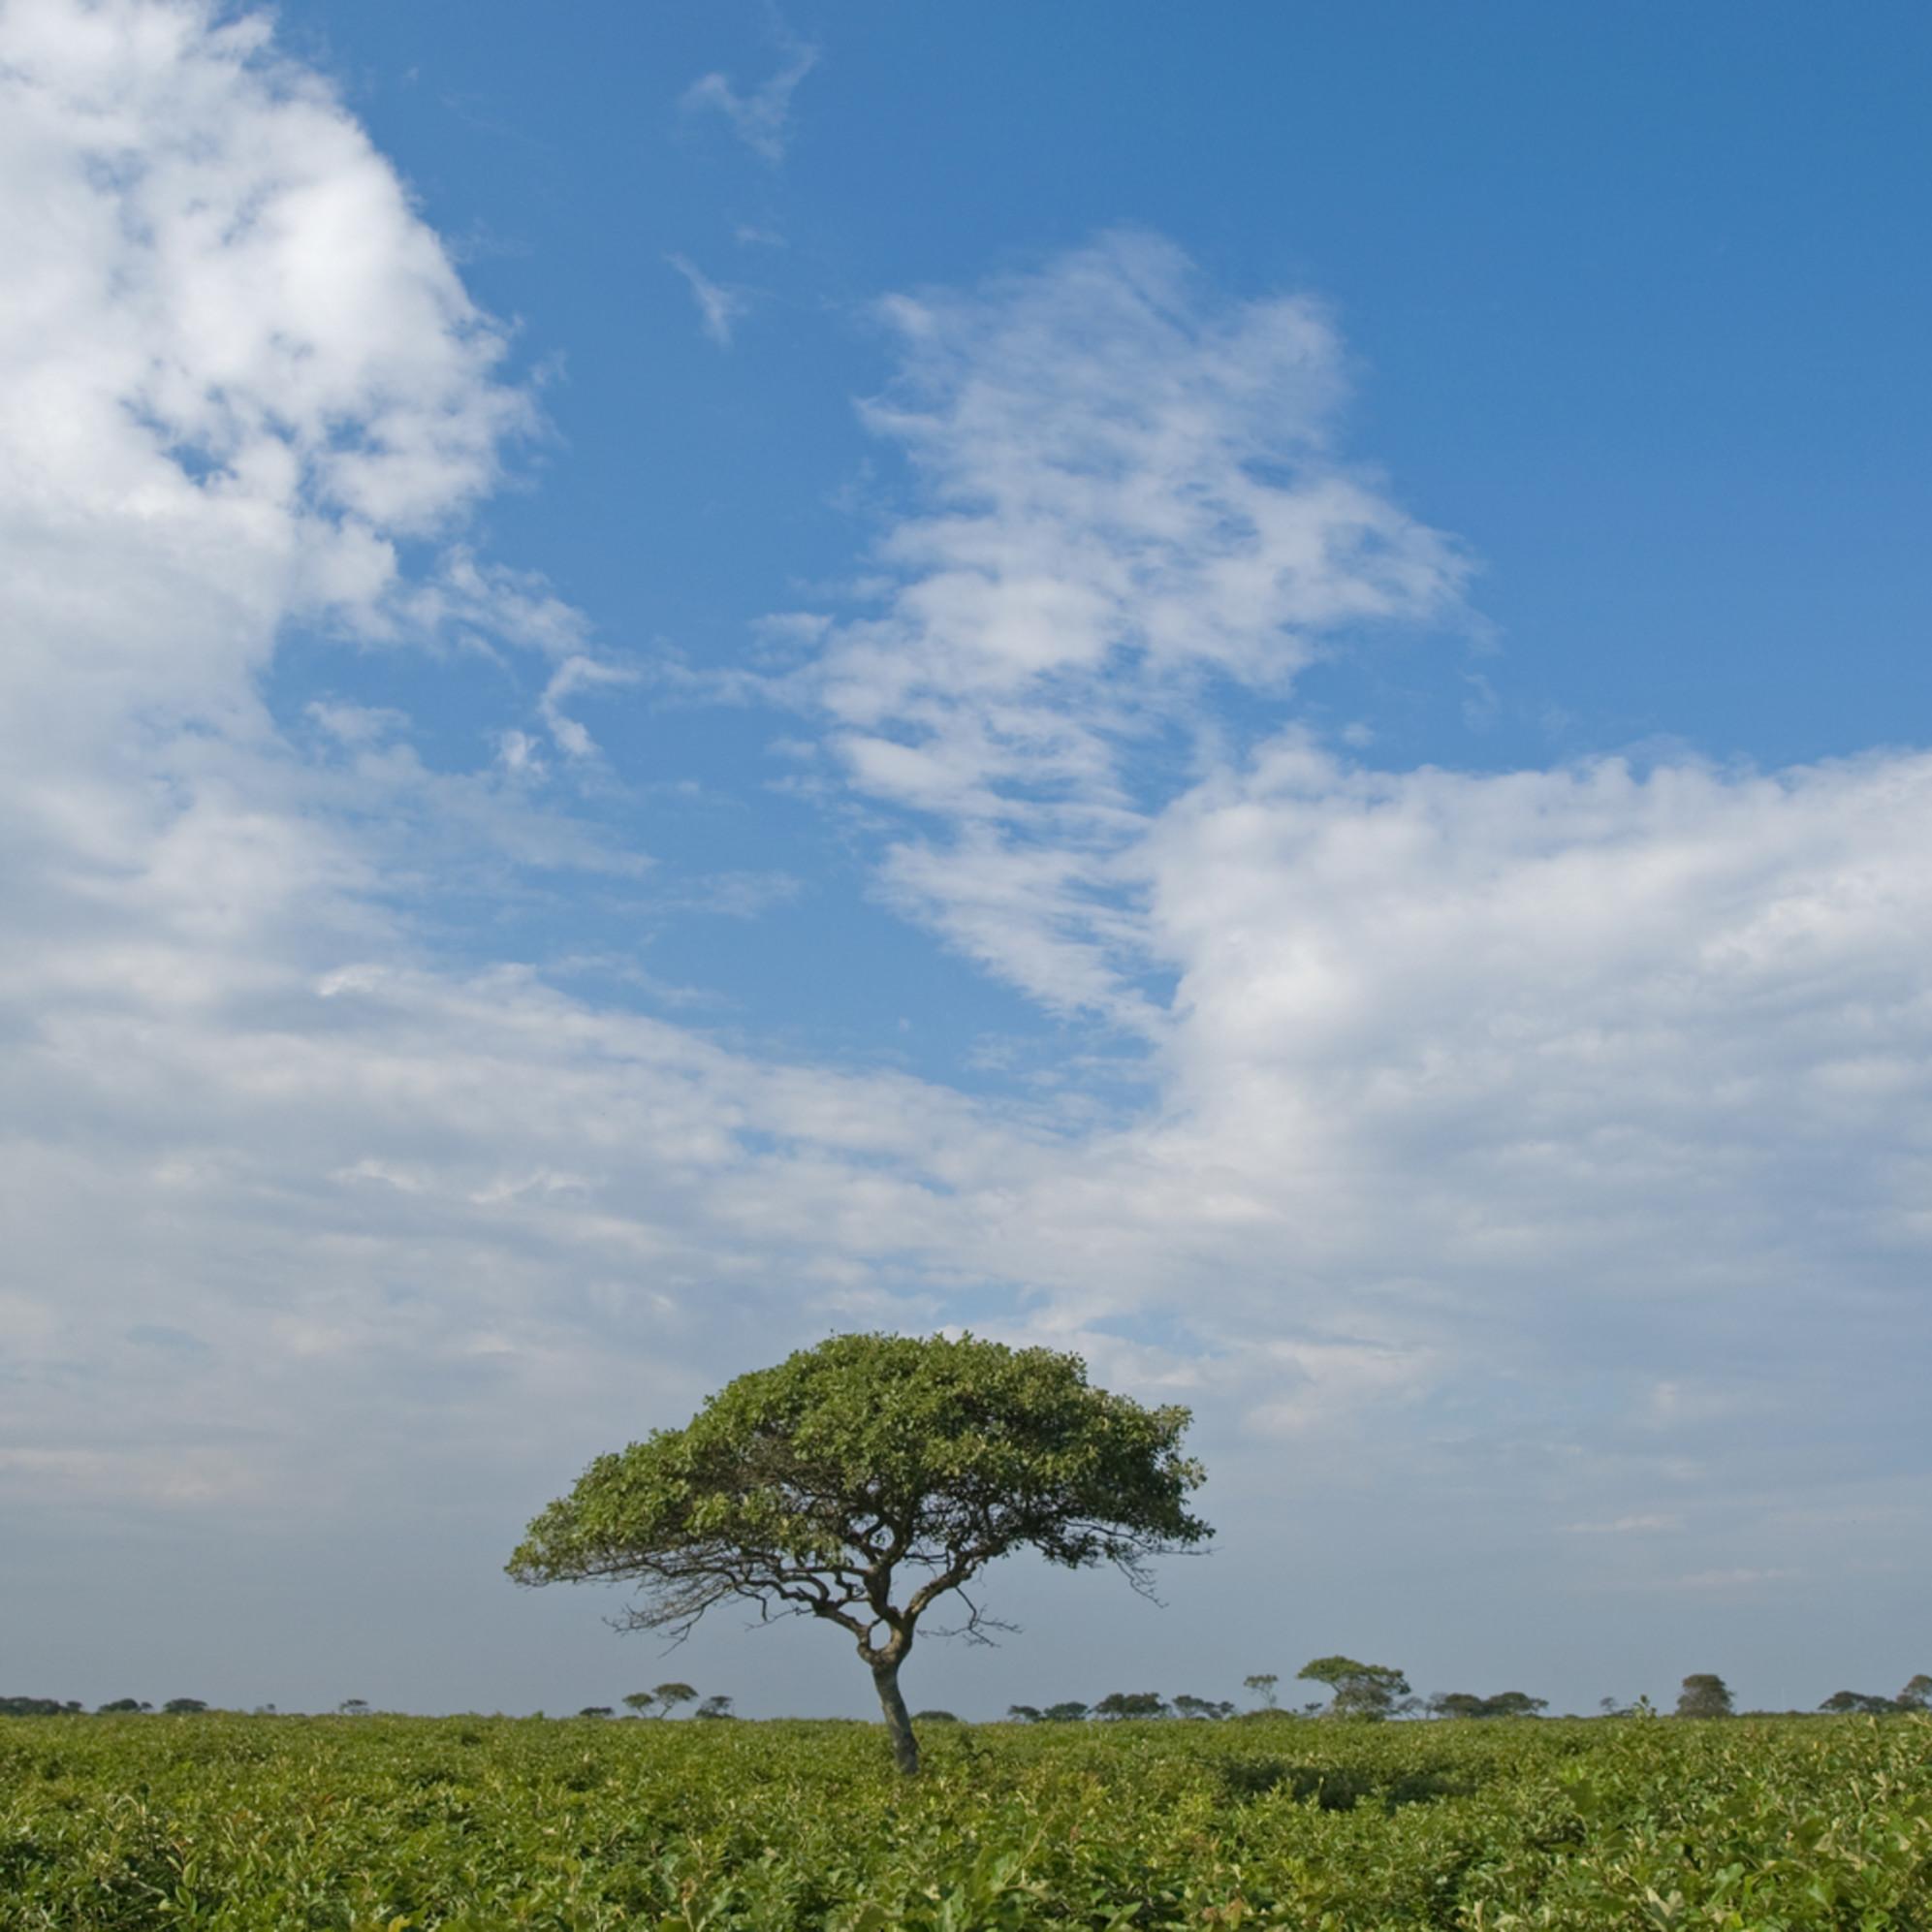 Moors tree kn bkazck